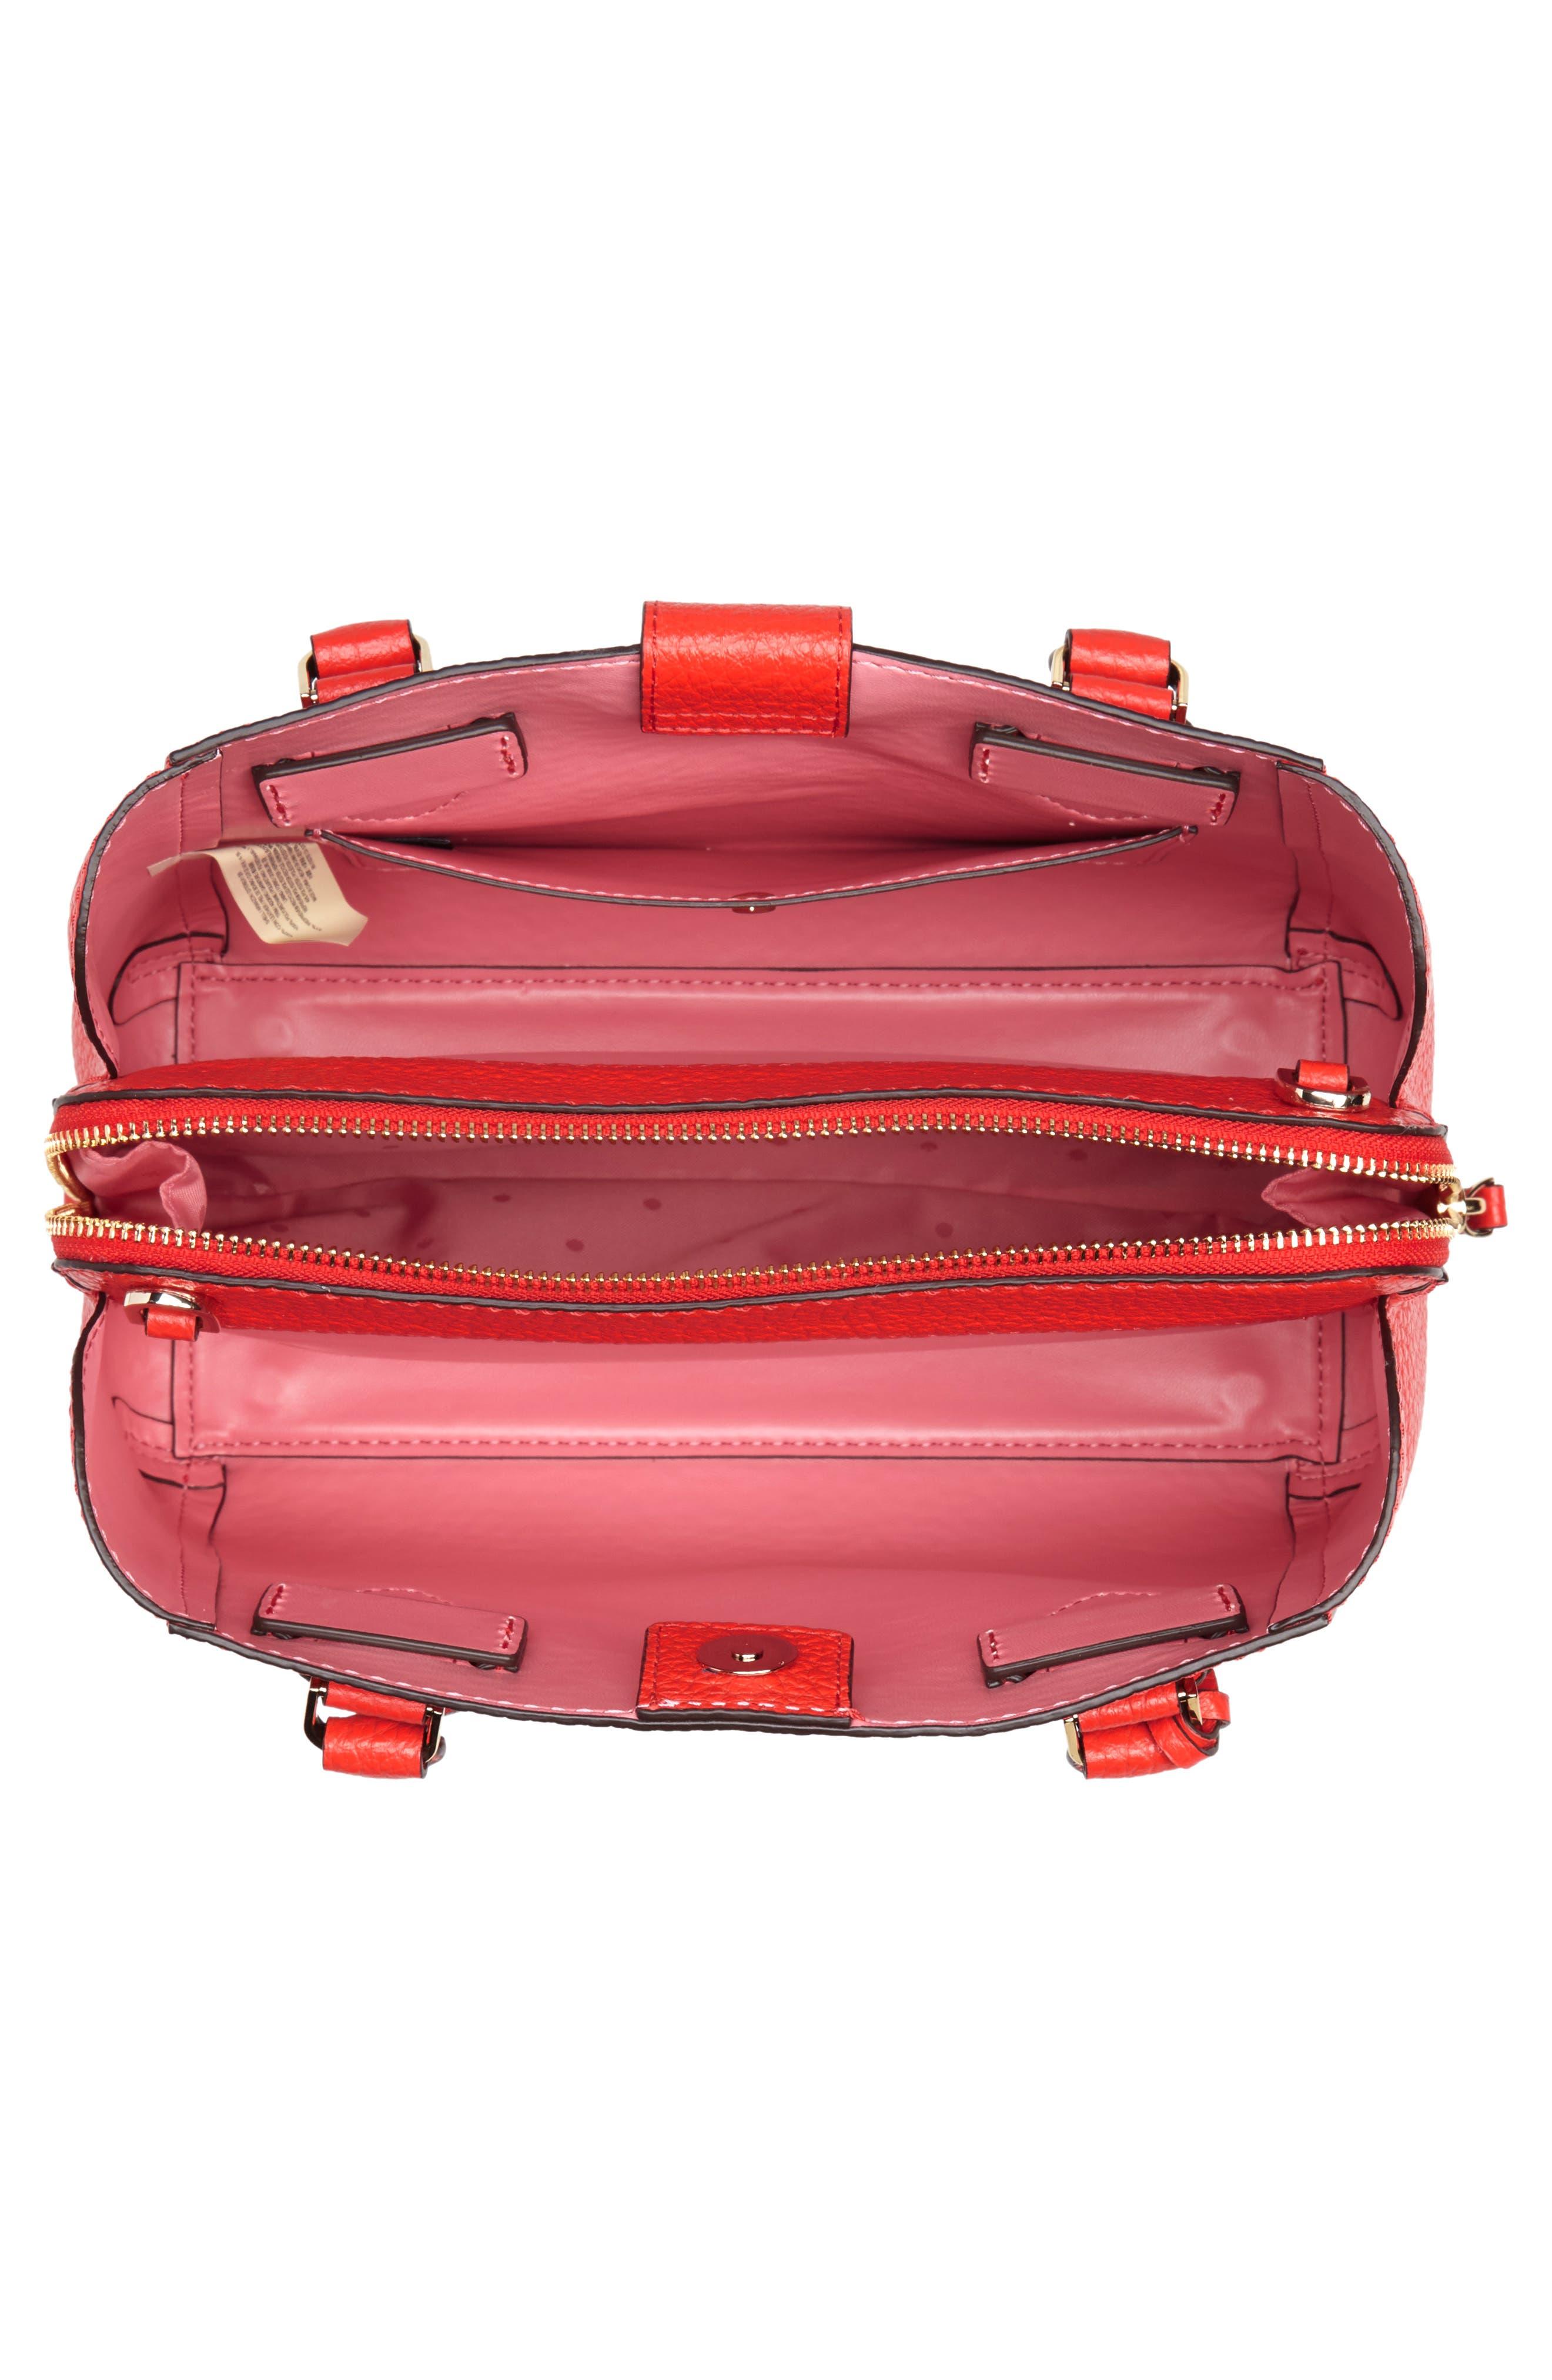 carter street - aliana leather satchel,                             Alternate thumbnail 4, color,                             Picnic Red